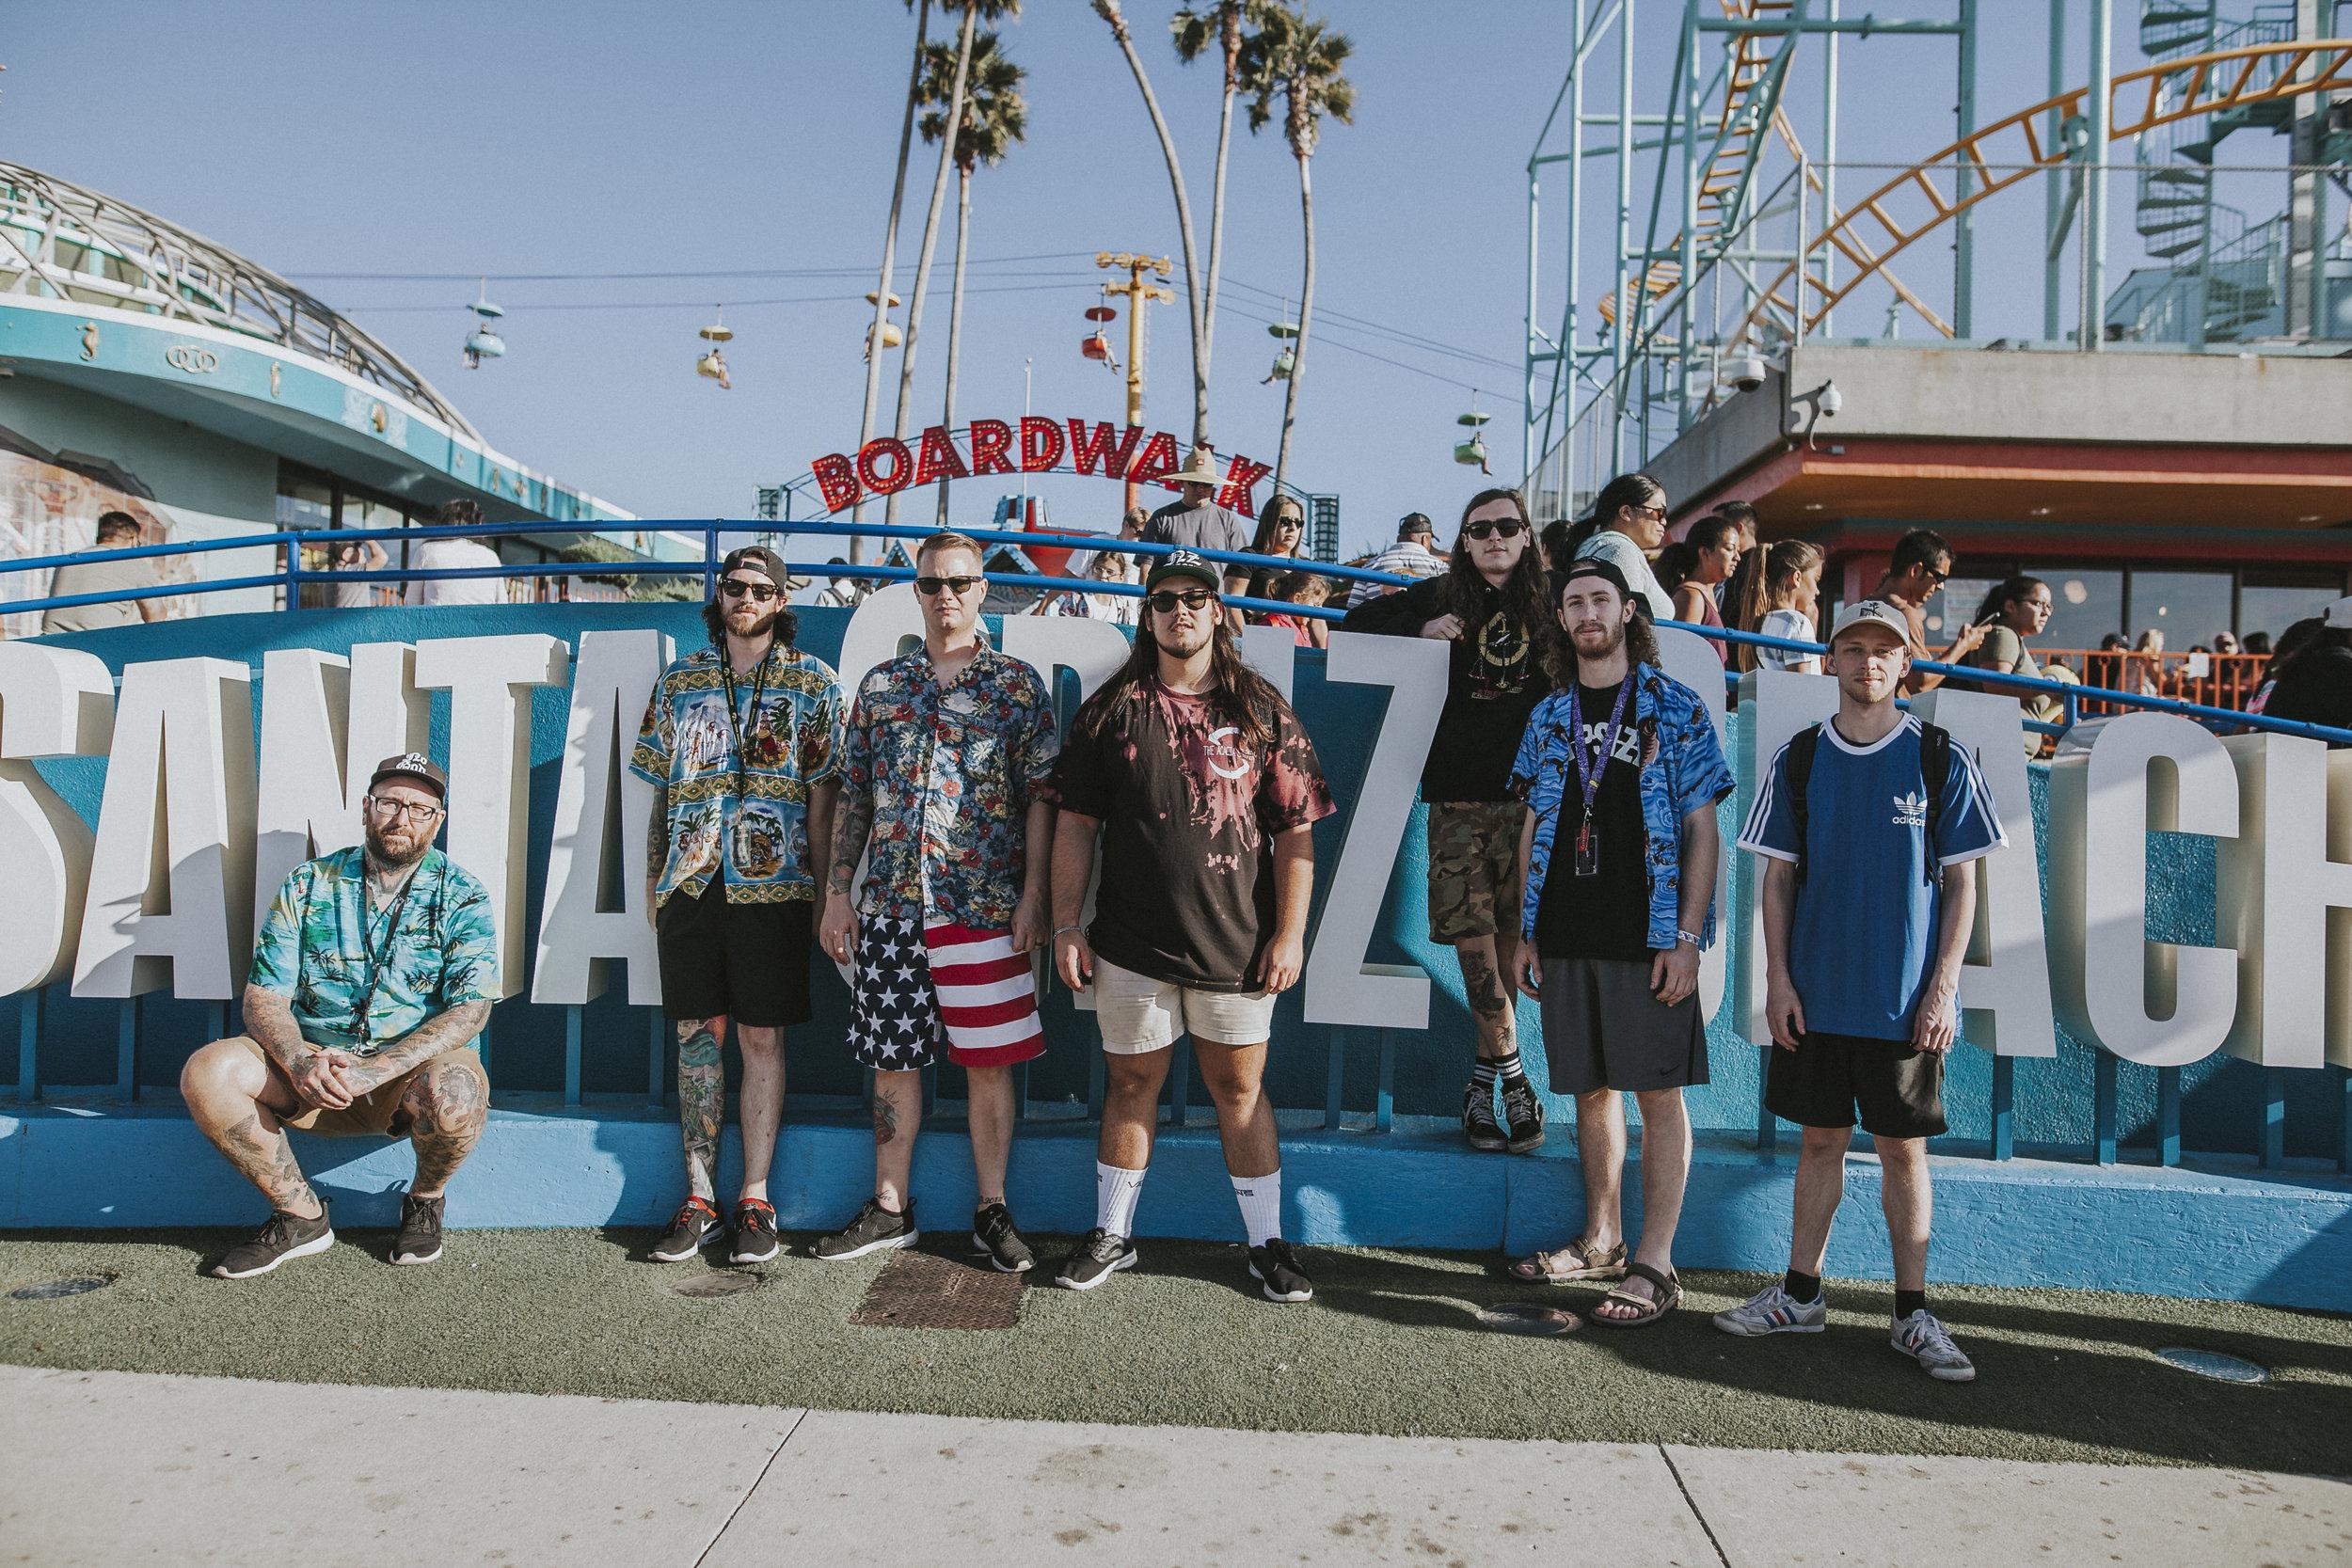 Squad Boardwalk.jpg